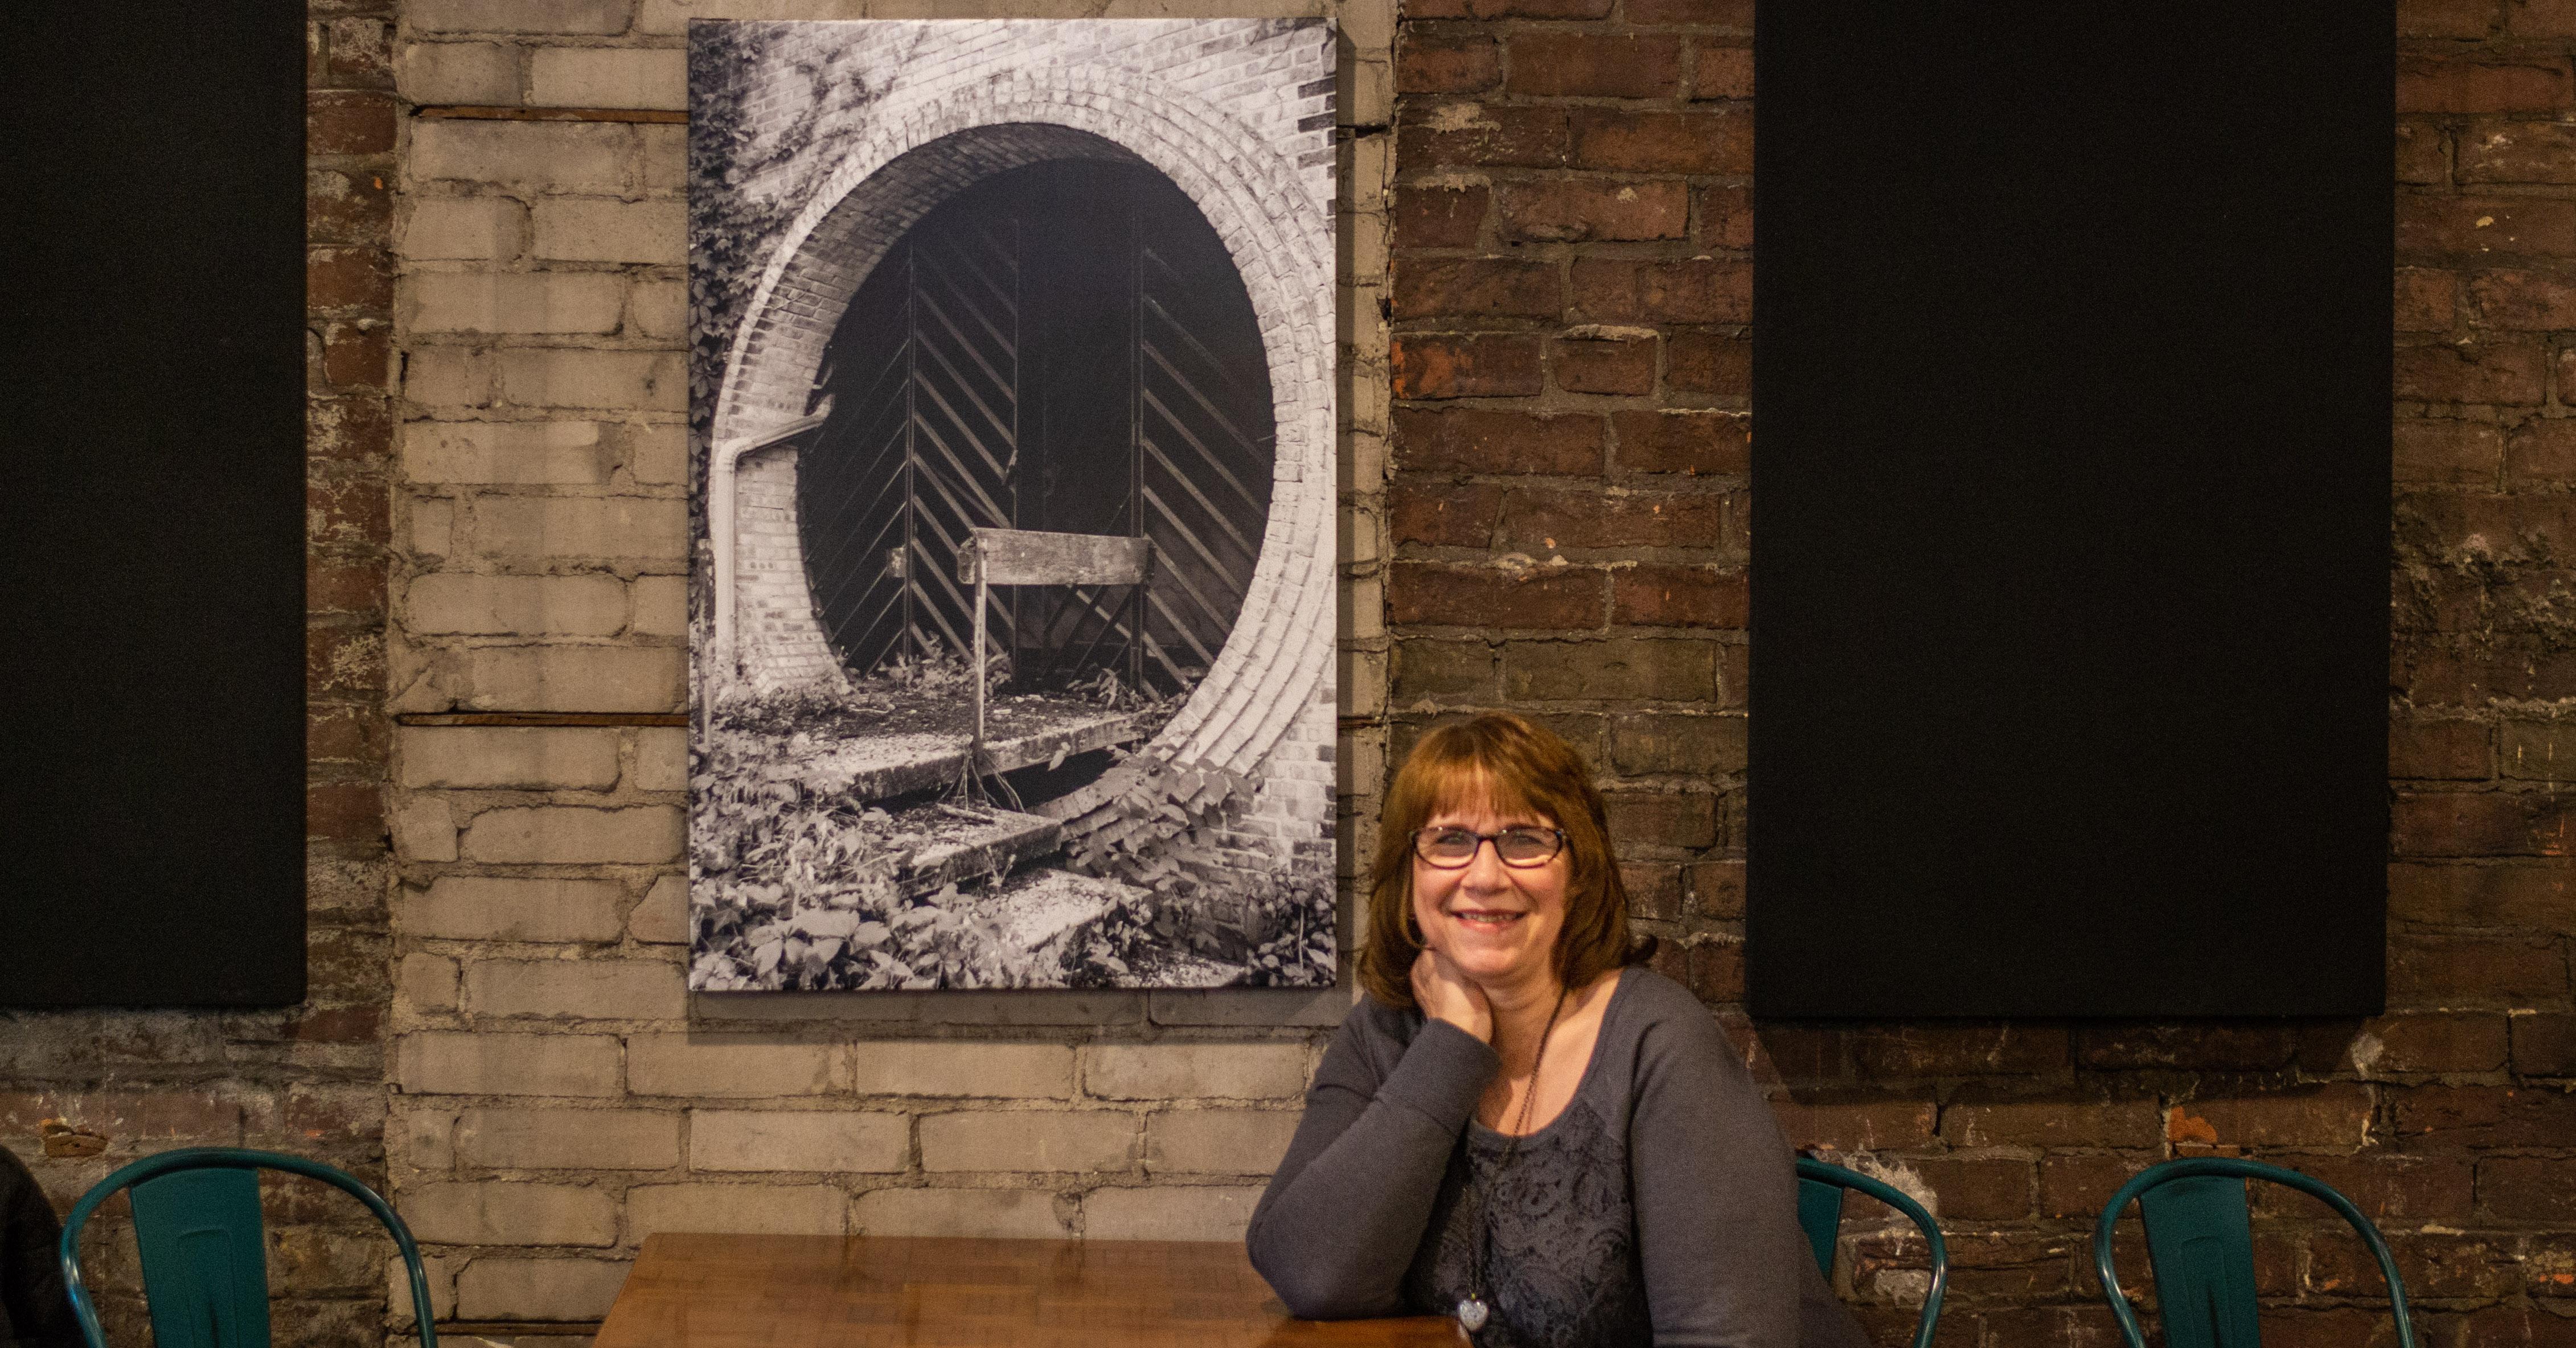 Fiddlehead helps local artist's dream come true